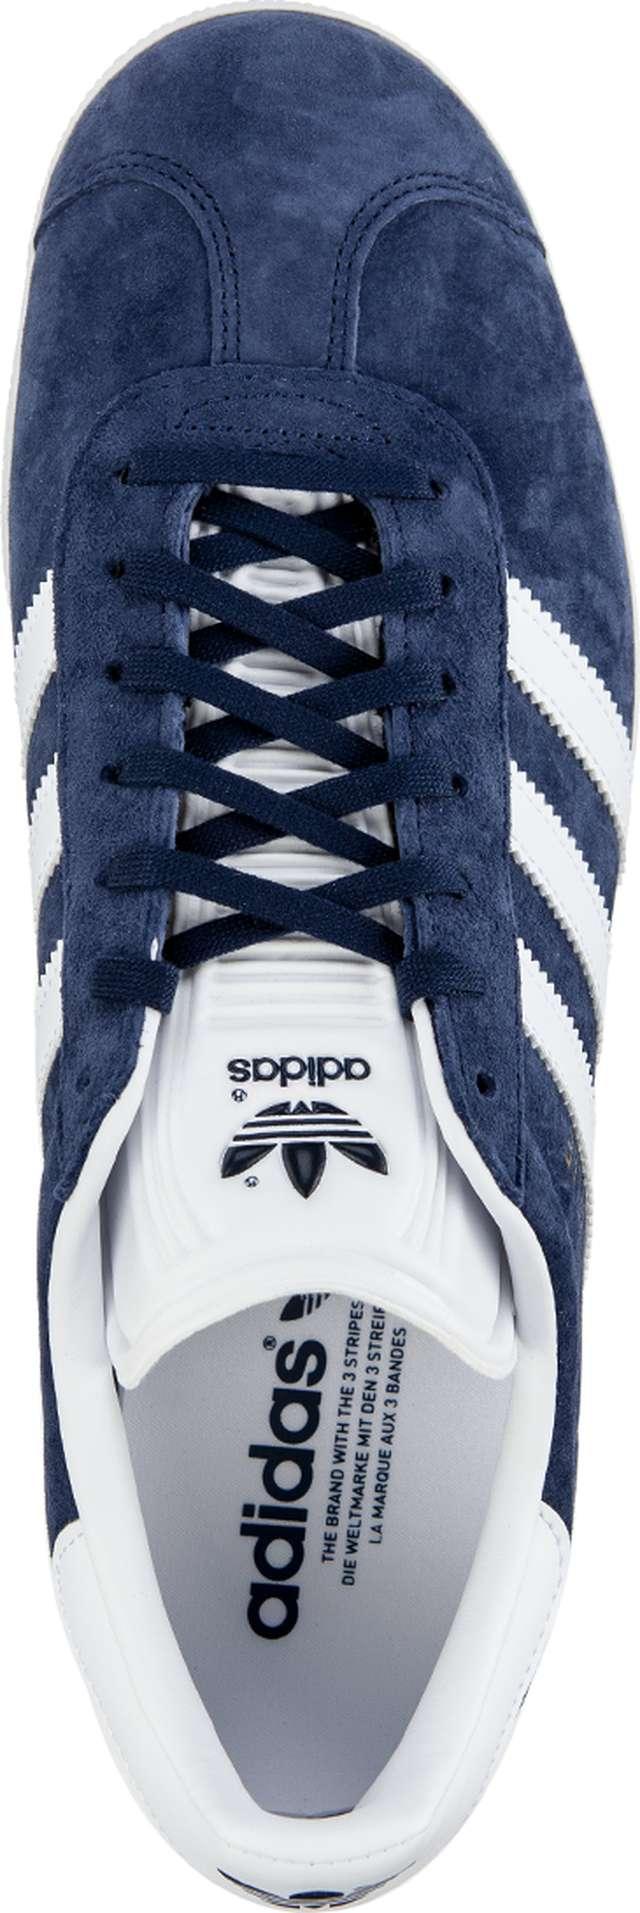 Buty adidas Gazelle 478 eastend.pl